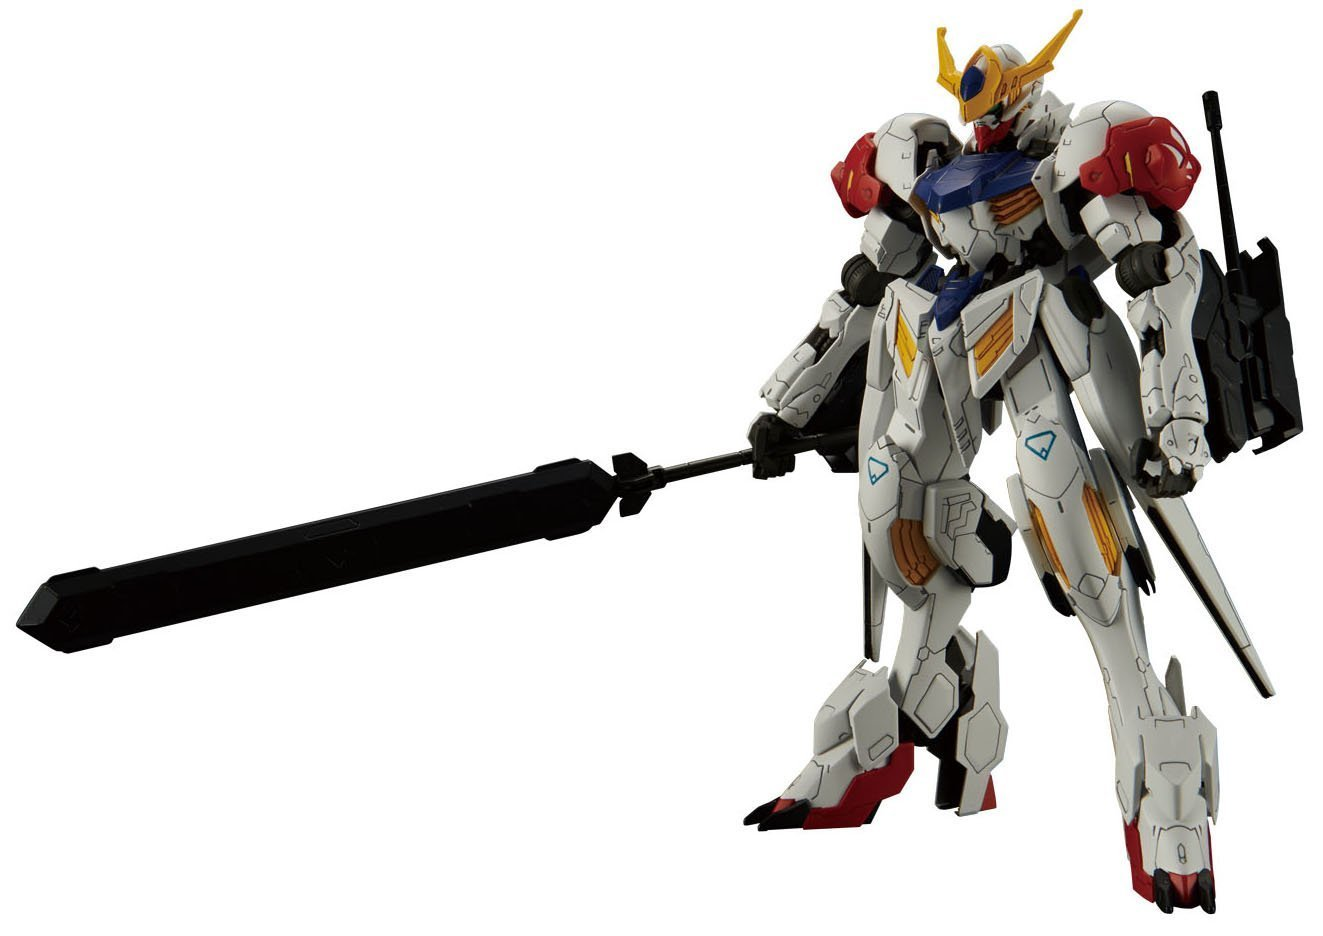 Bandai Hobby Full Mechanics 1/100 IBO Gundam Barbatos Lupus Gundam IBO: Season 2 Building Kit